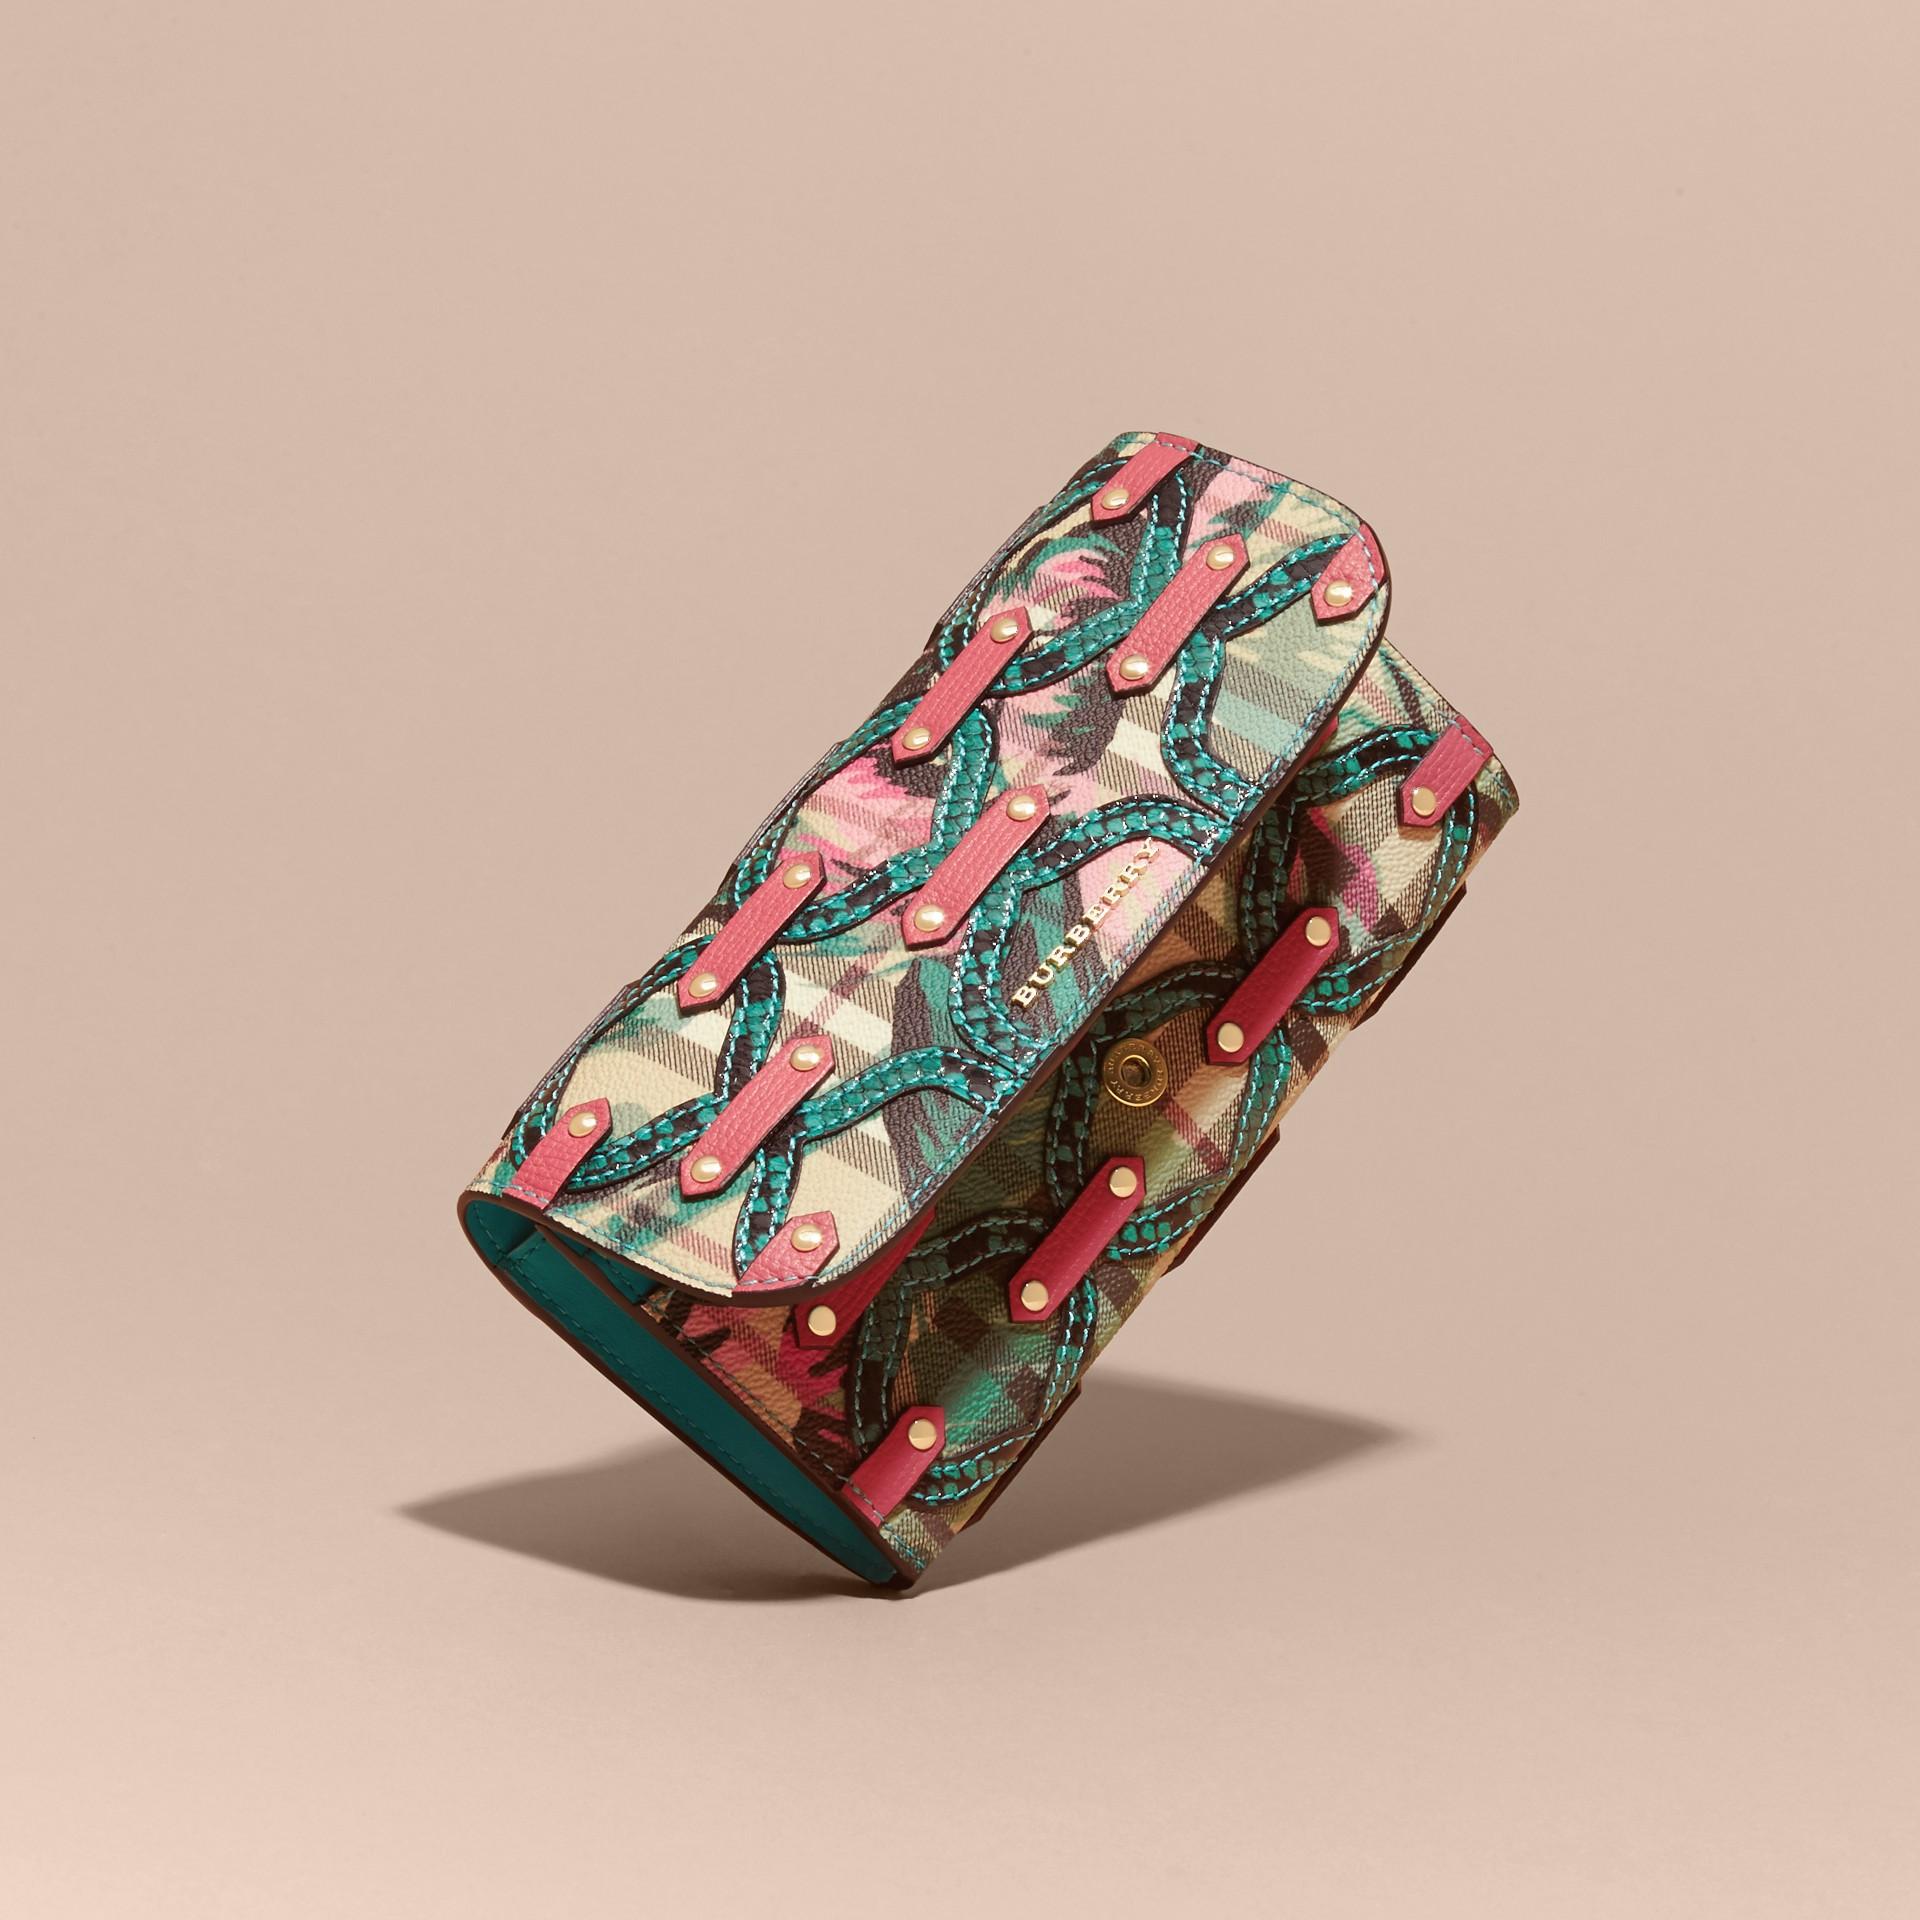 Snakeskin Appliqué Peony Rose Print Haymarket Check Continental Wallet in Plum Pink - gallery image 3